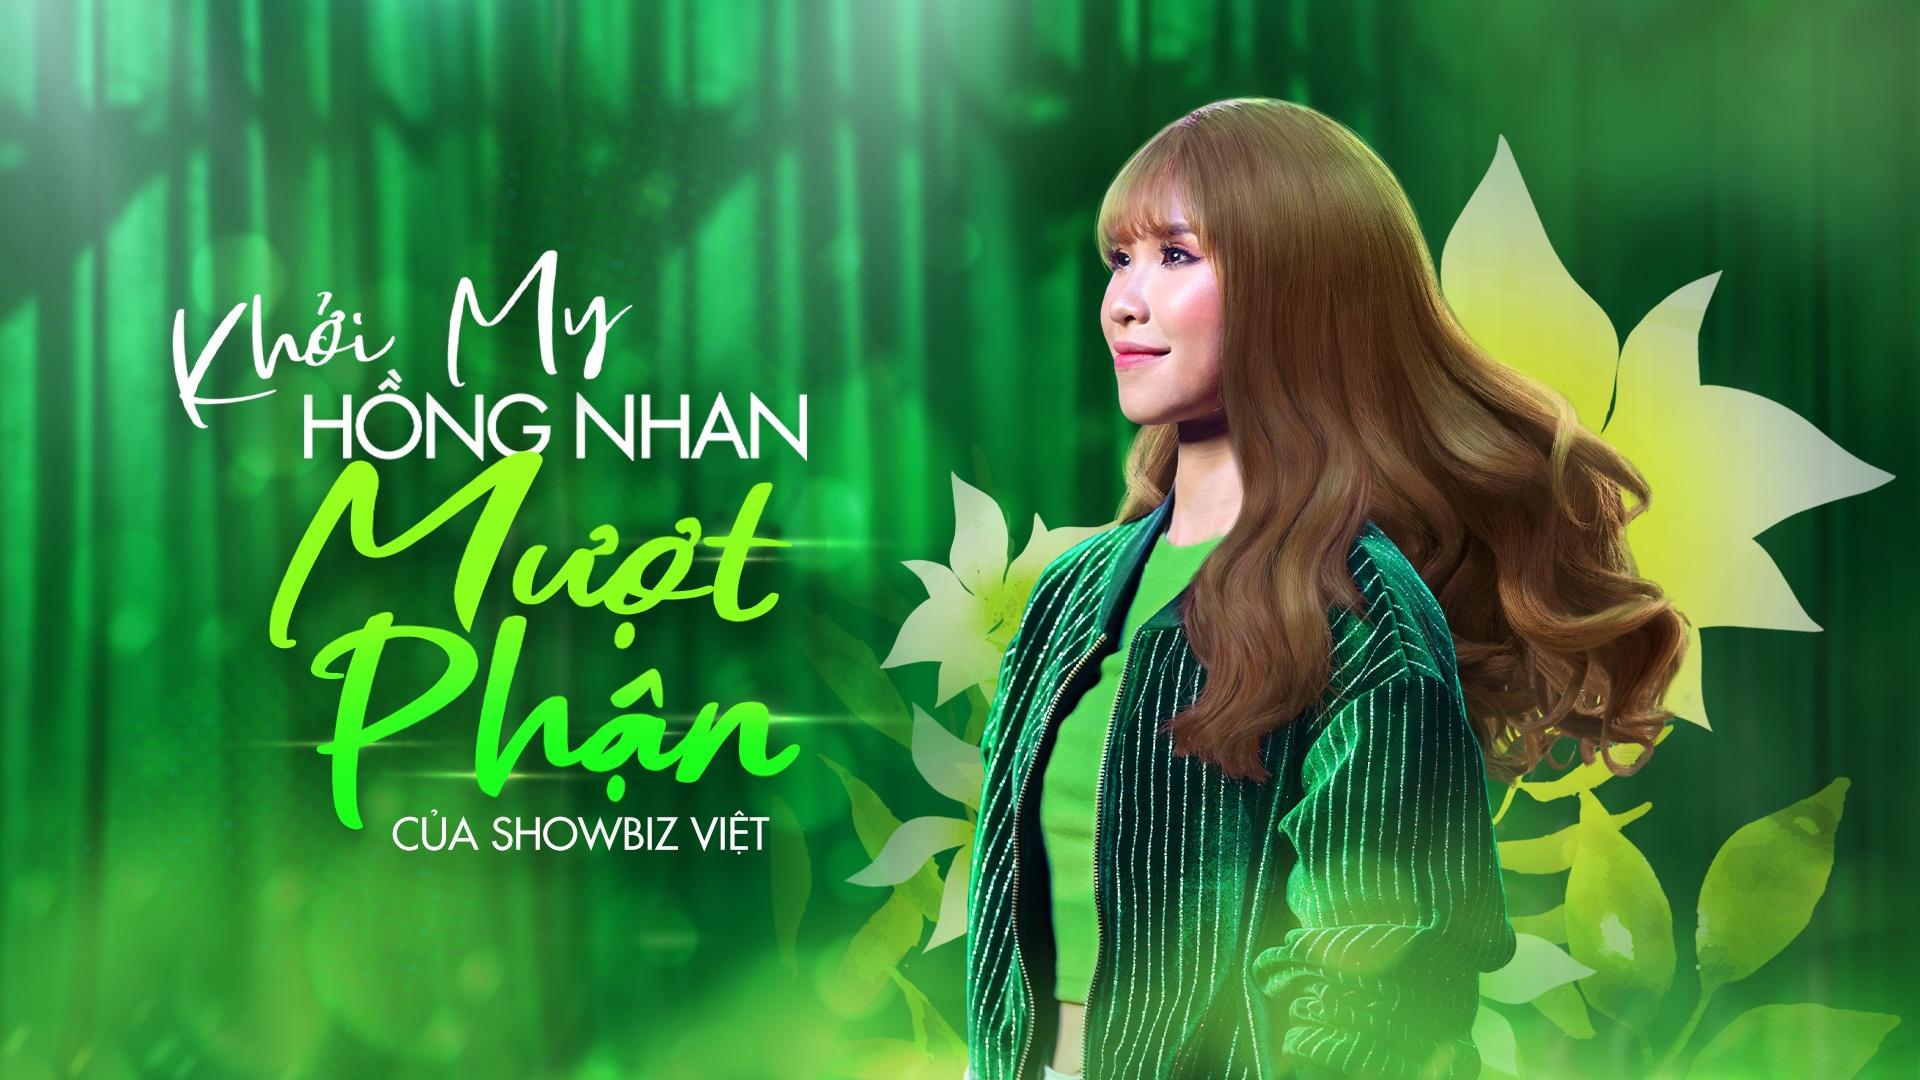 Khoi My - 'hong nhan muot phan' cua showbiz Viet hinh anh 2